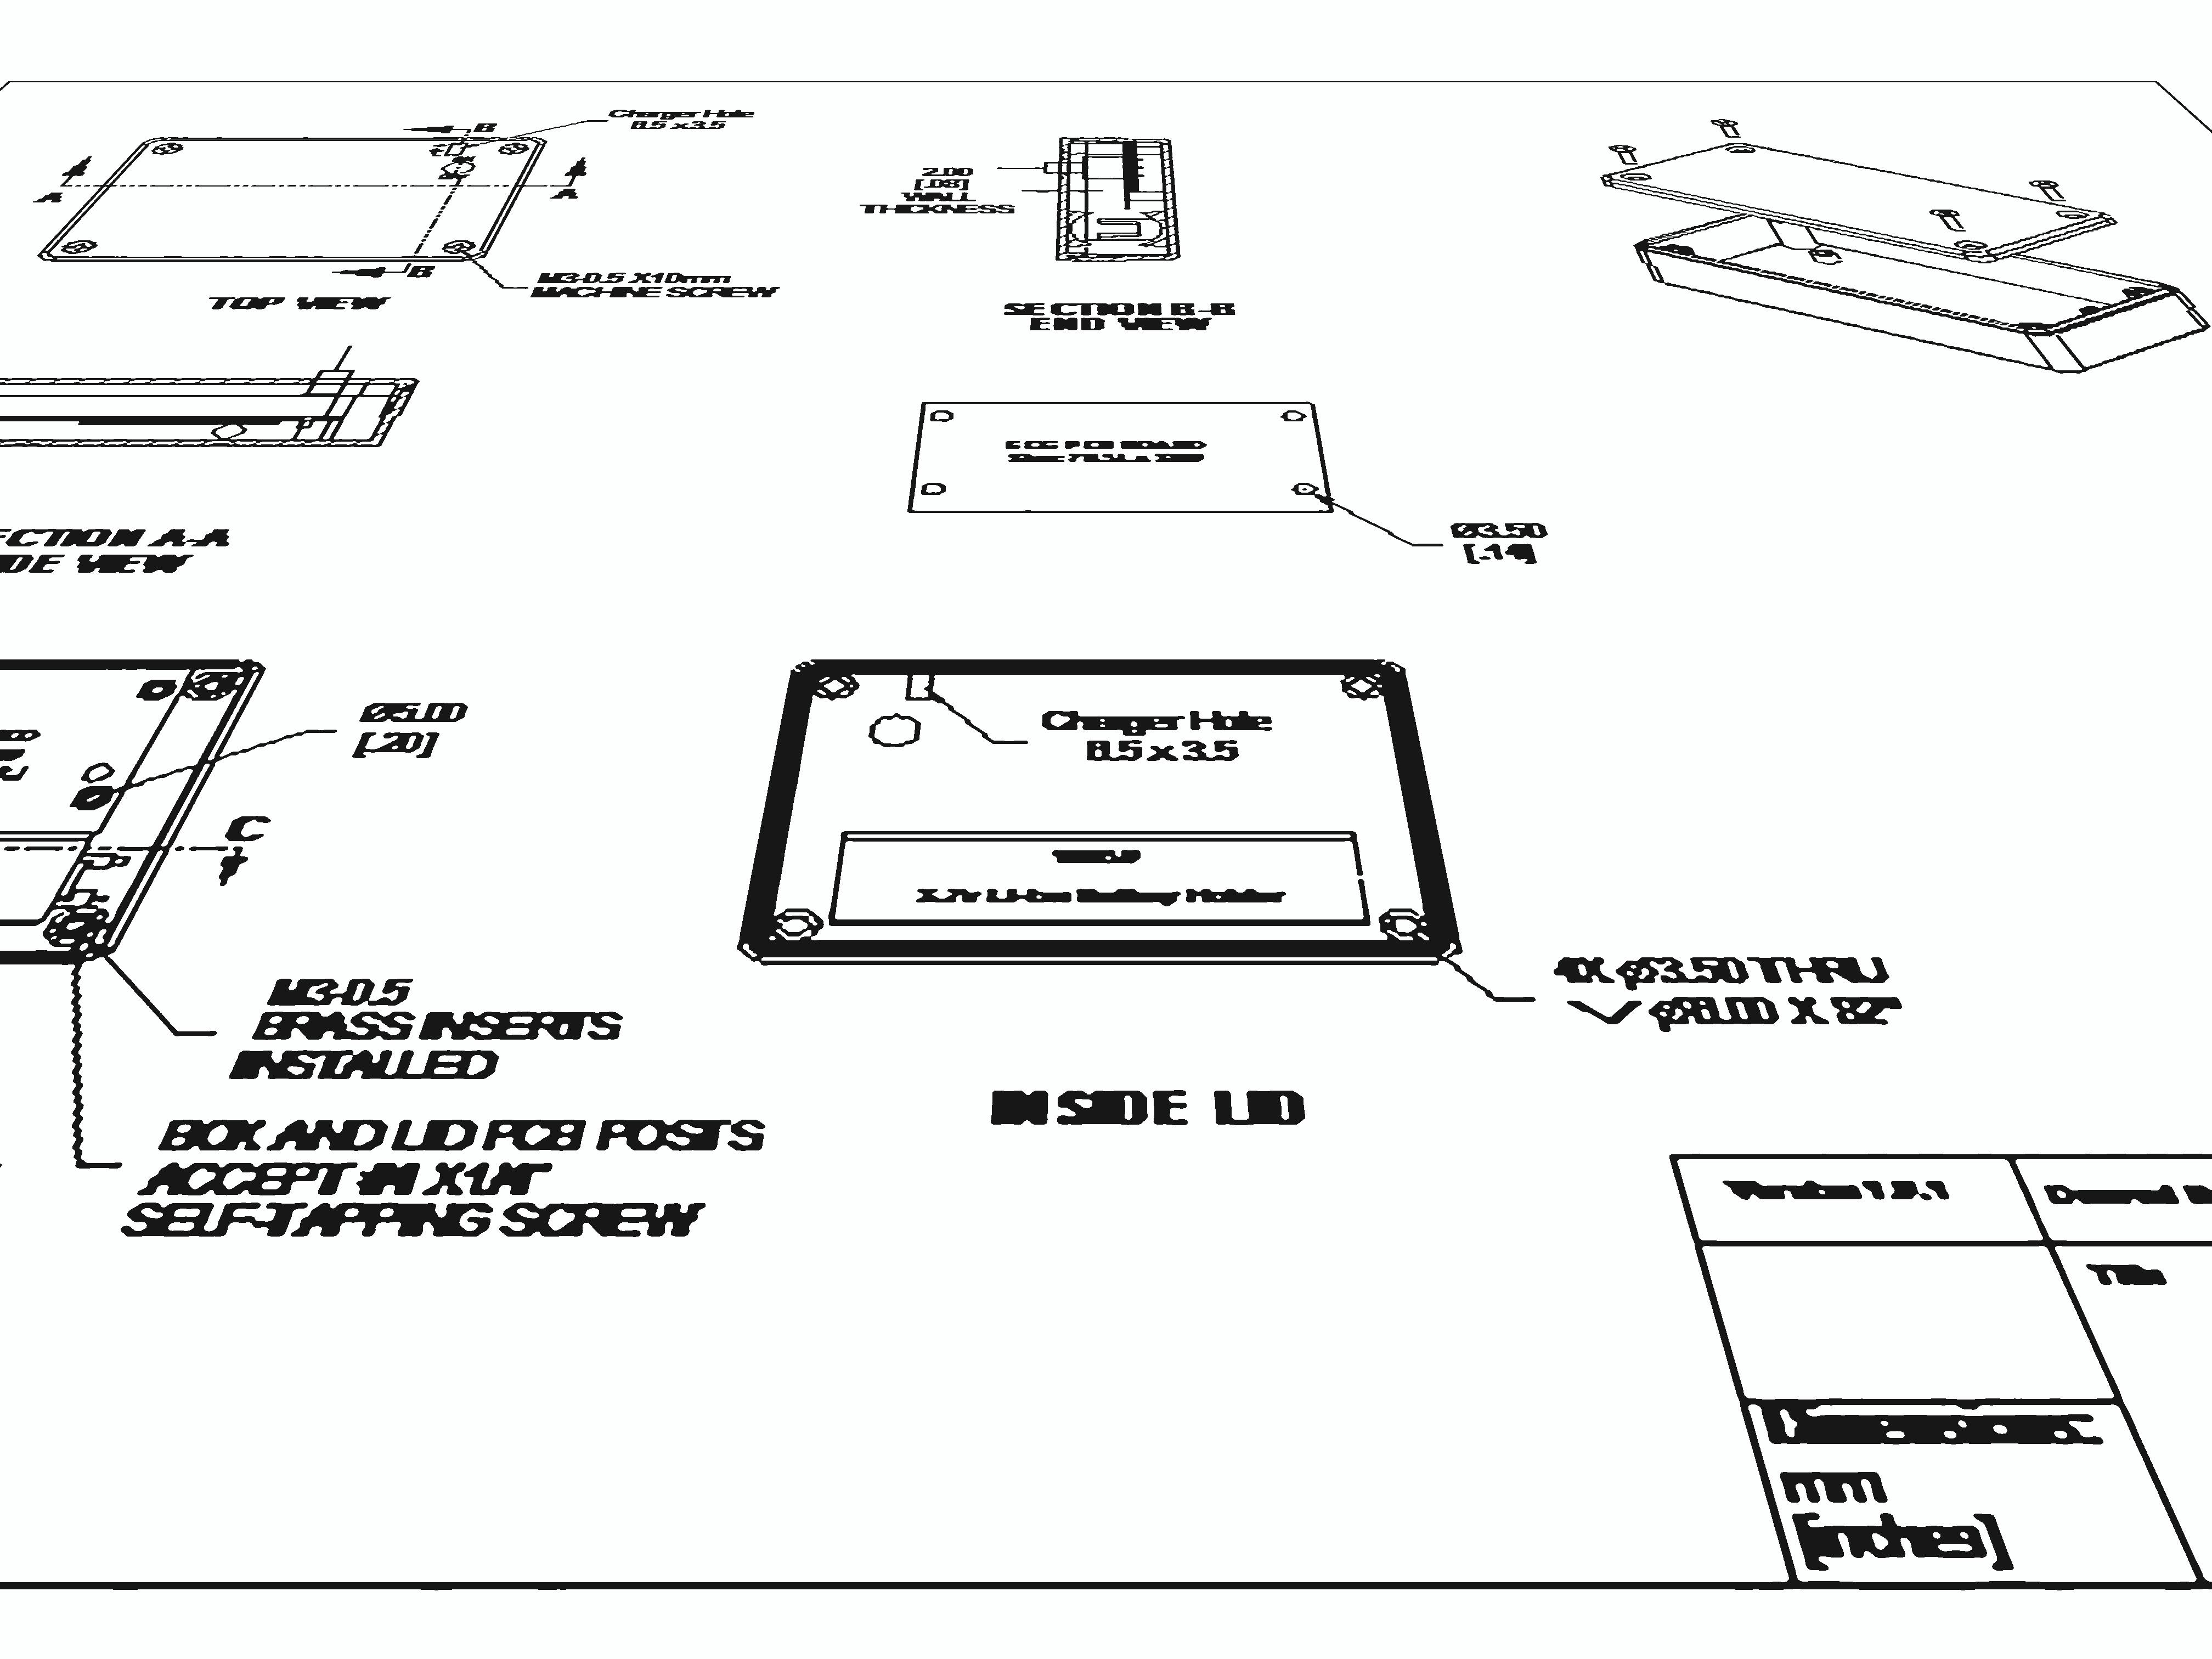 ecg-Monitor-Prototype-3D-Printing-STL